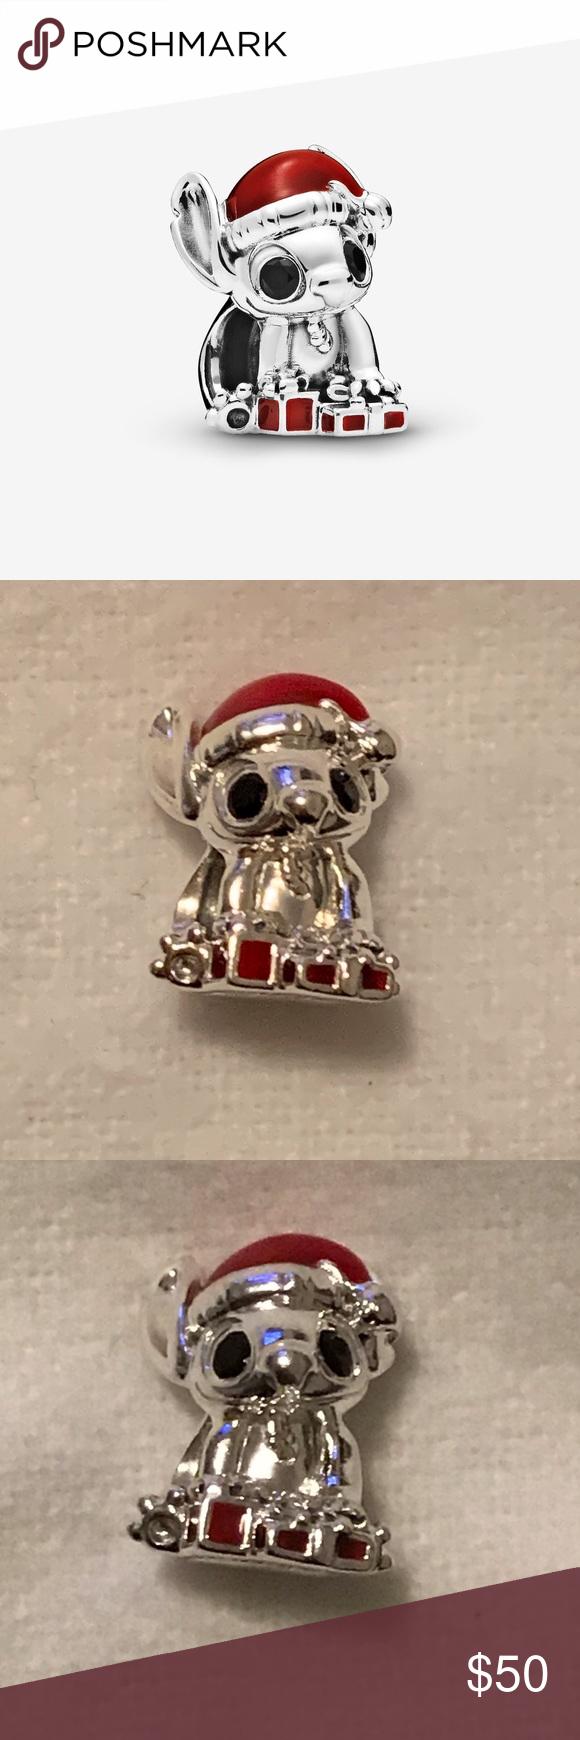 S⭕️LD‼️ Disney Stitch Christmas Pandora Charm | Pandora jewelry ...